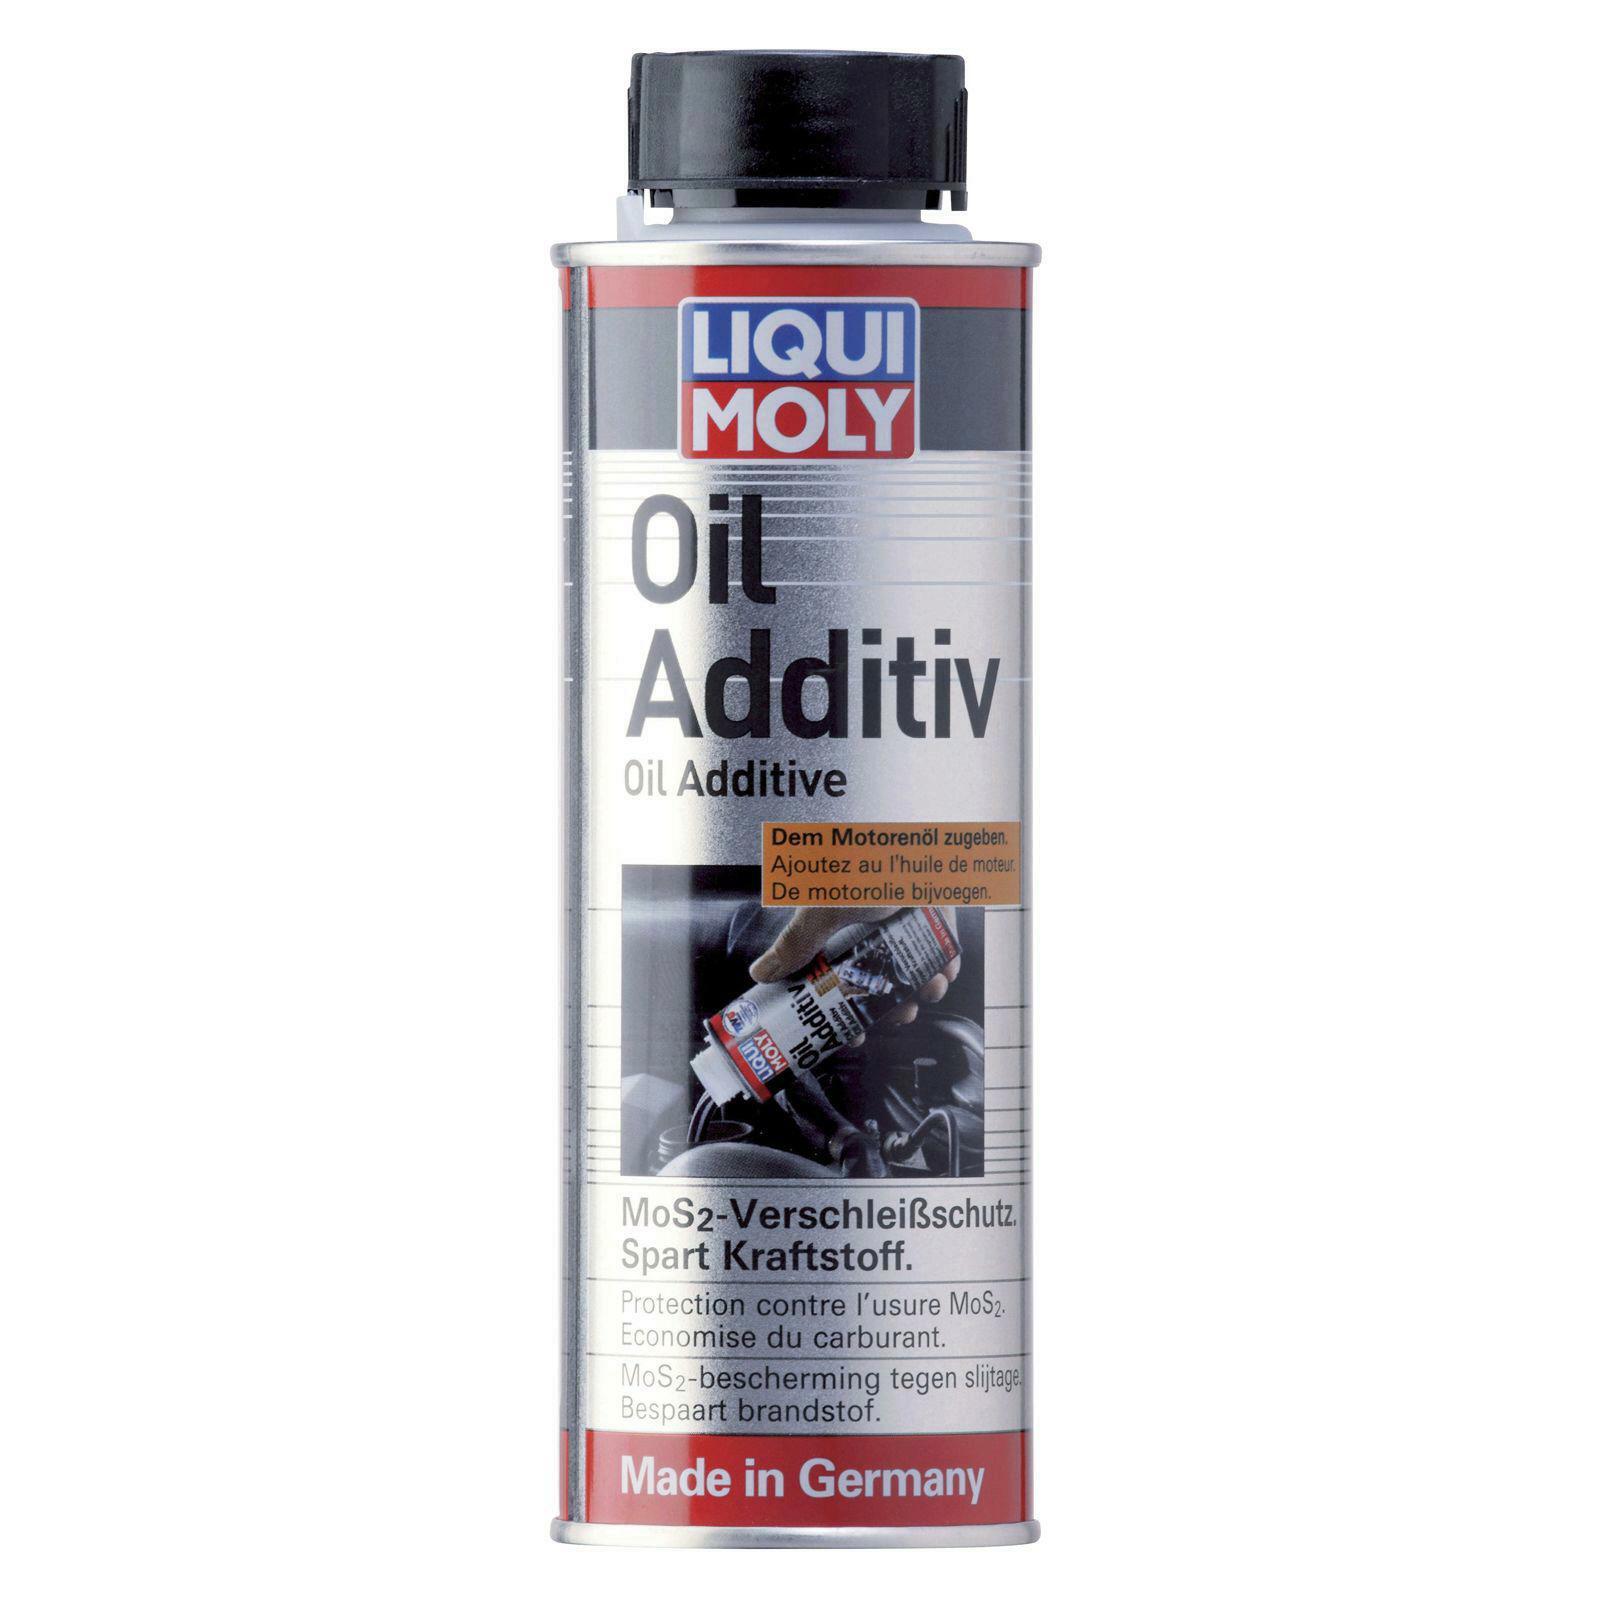 Liqui Moly Öl Additiv 200ml